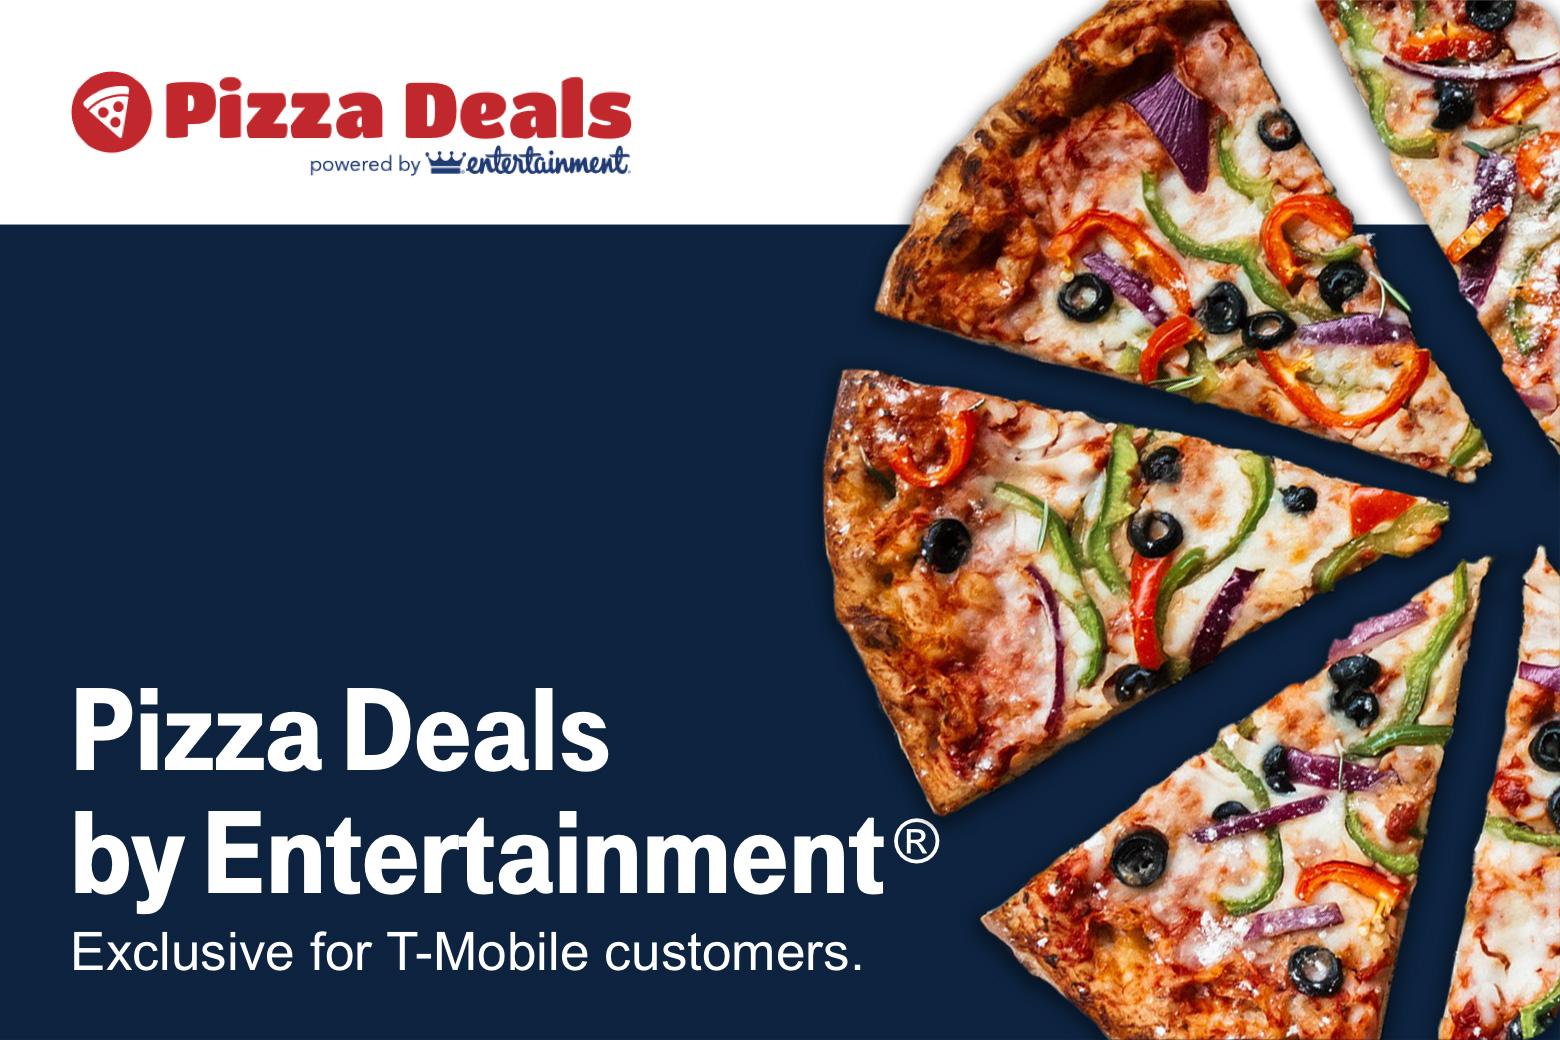 T-Mobile Customers (01/08): Pizza Deals, 10 free 4x6 Prints Walgreens, Kroger $3 off $10